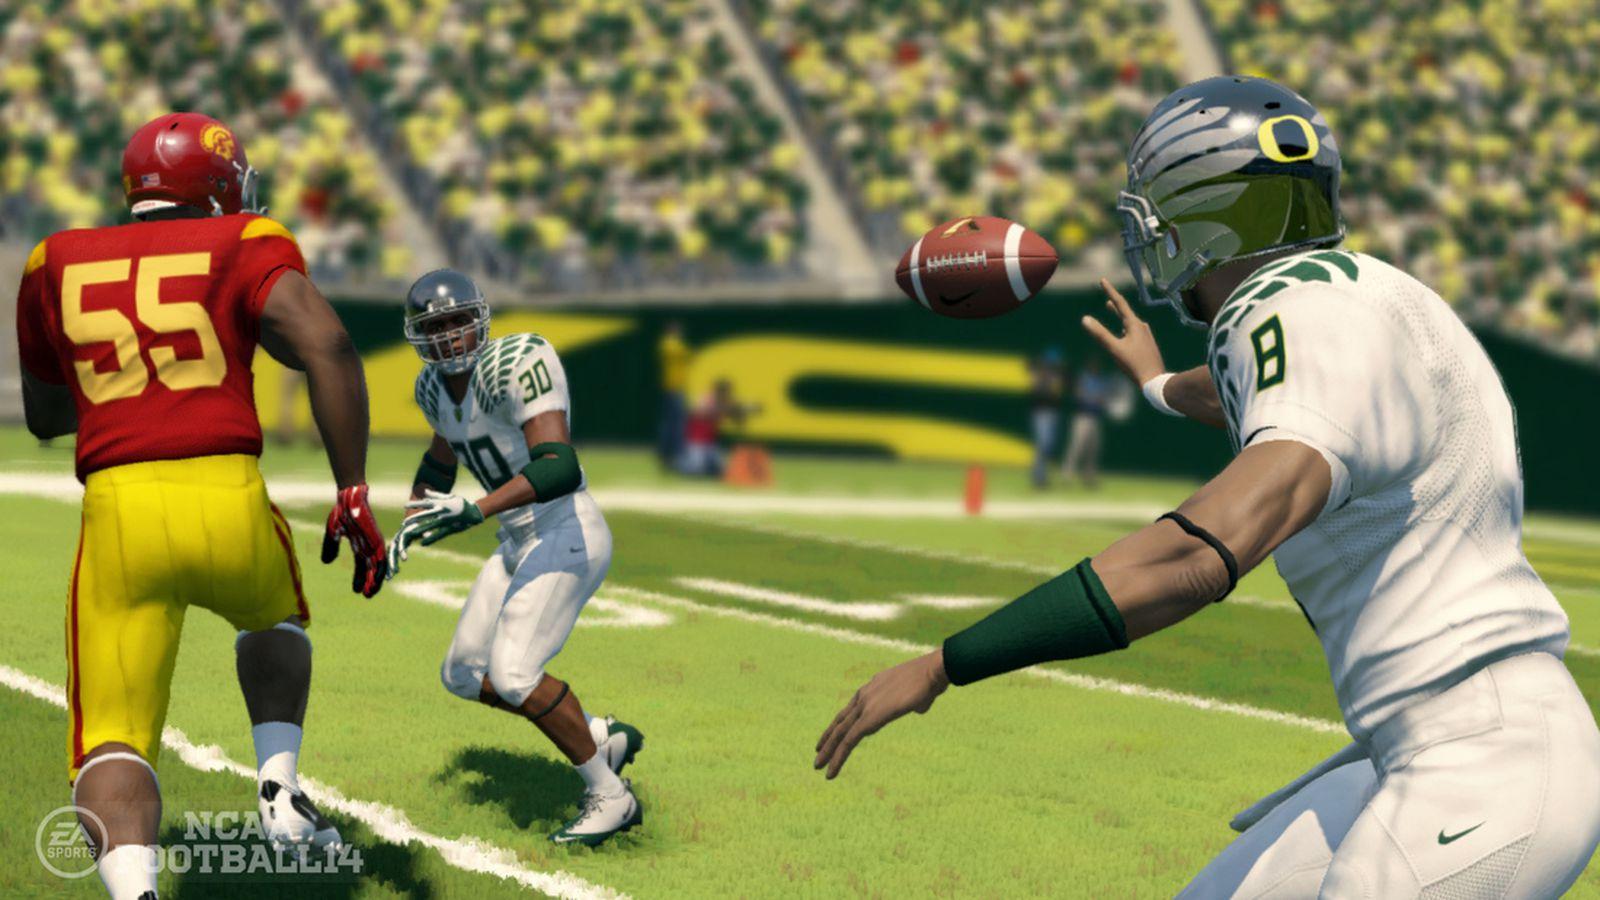 NCAA Football 14's Dynasty Mode includes new Power ...